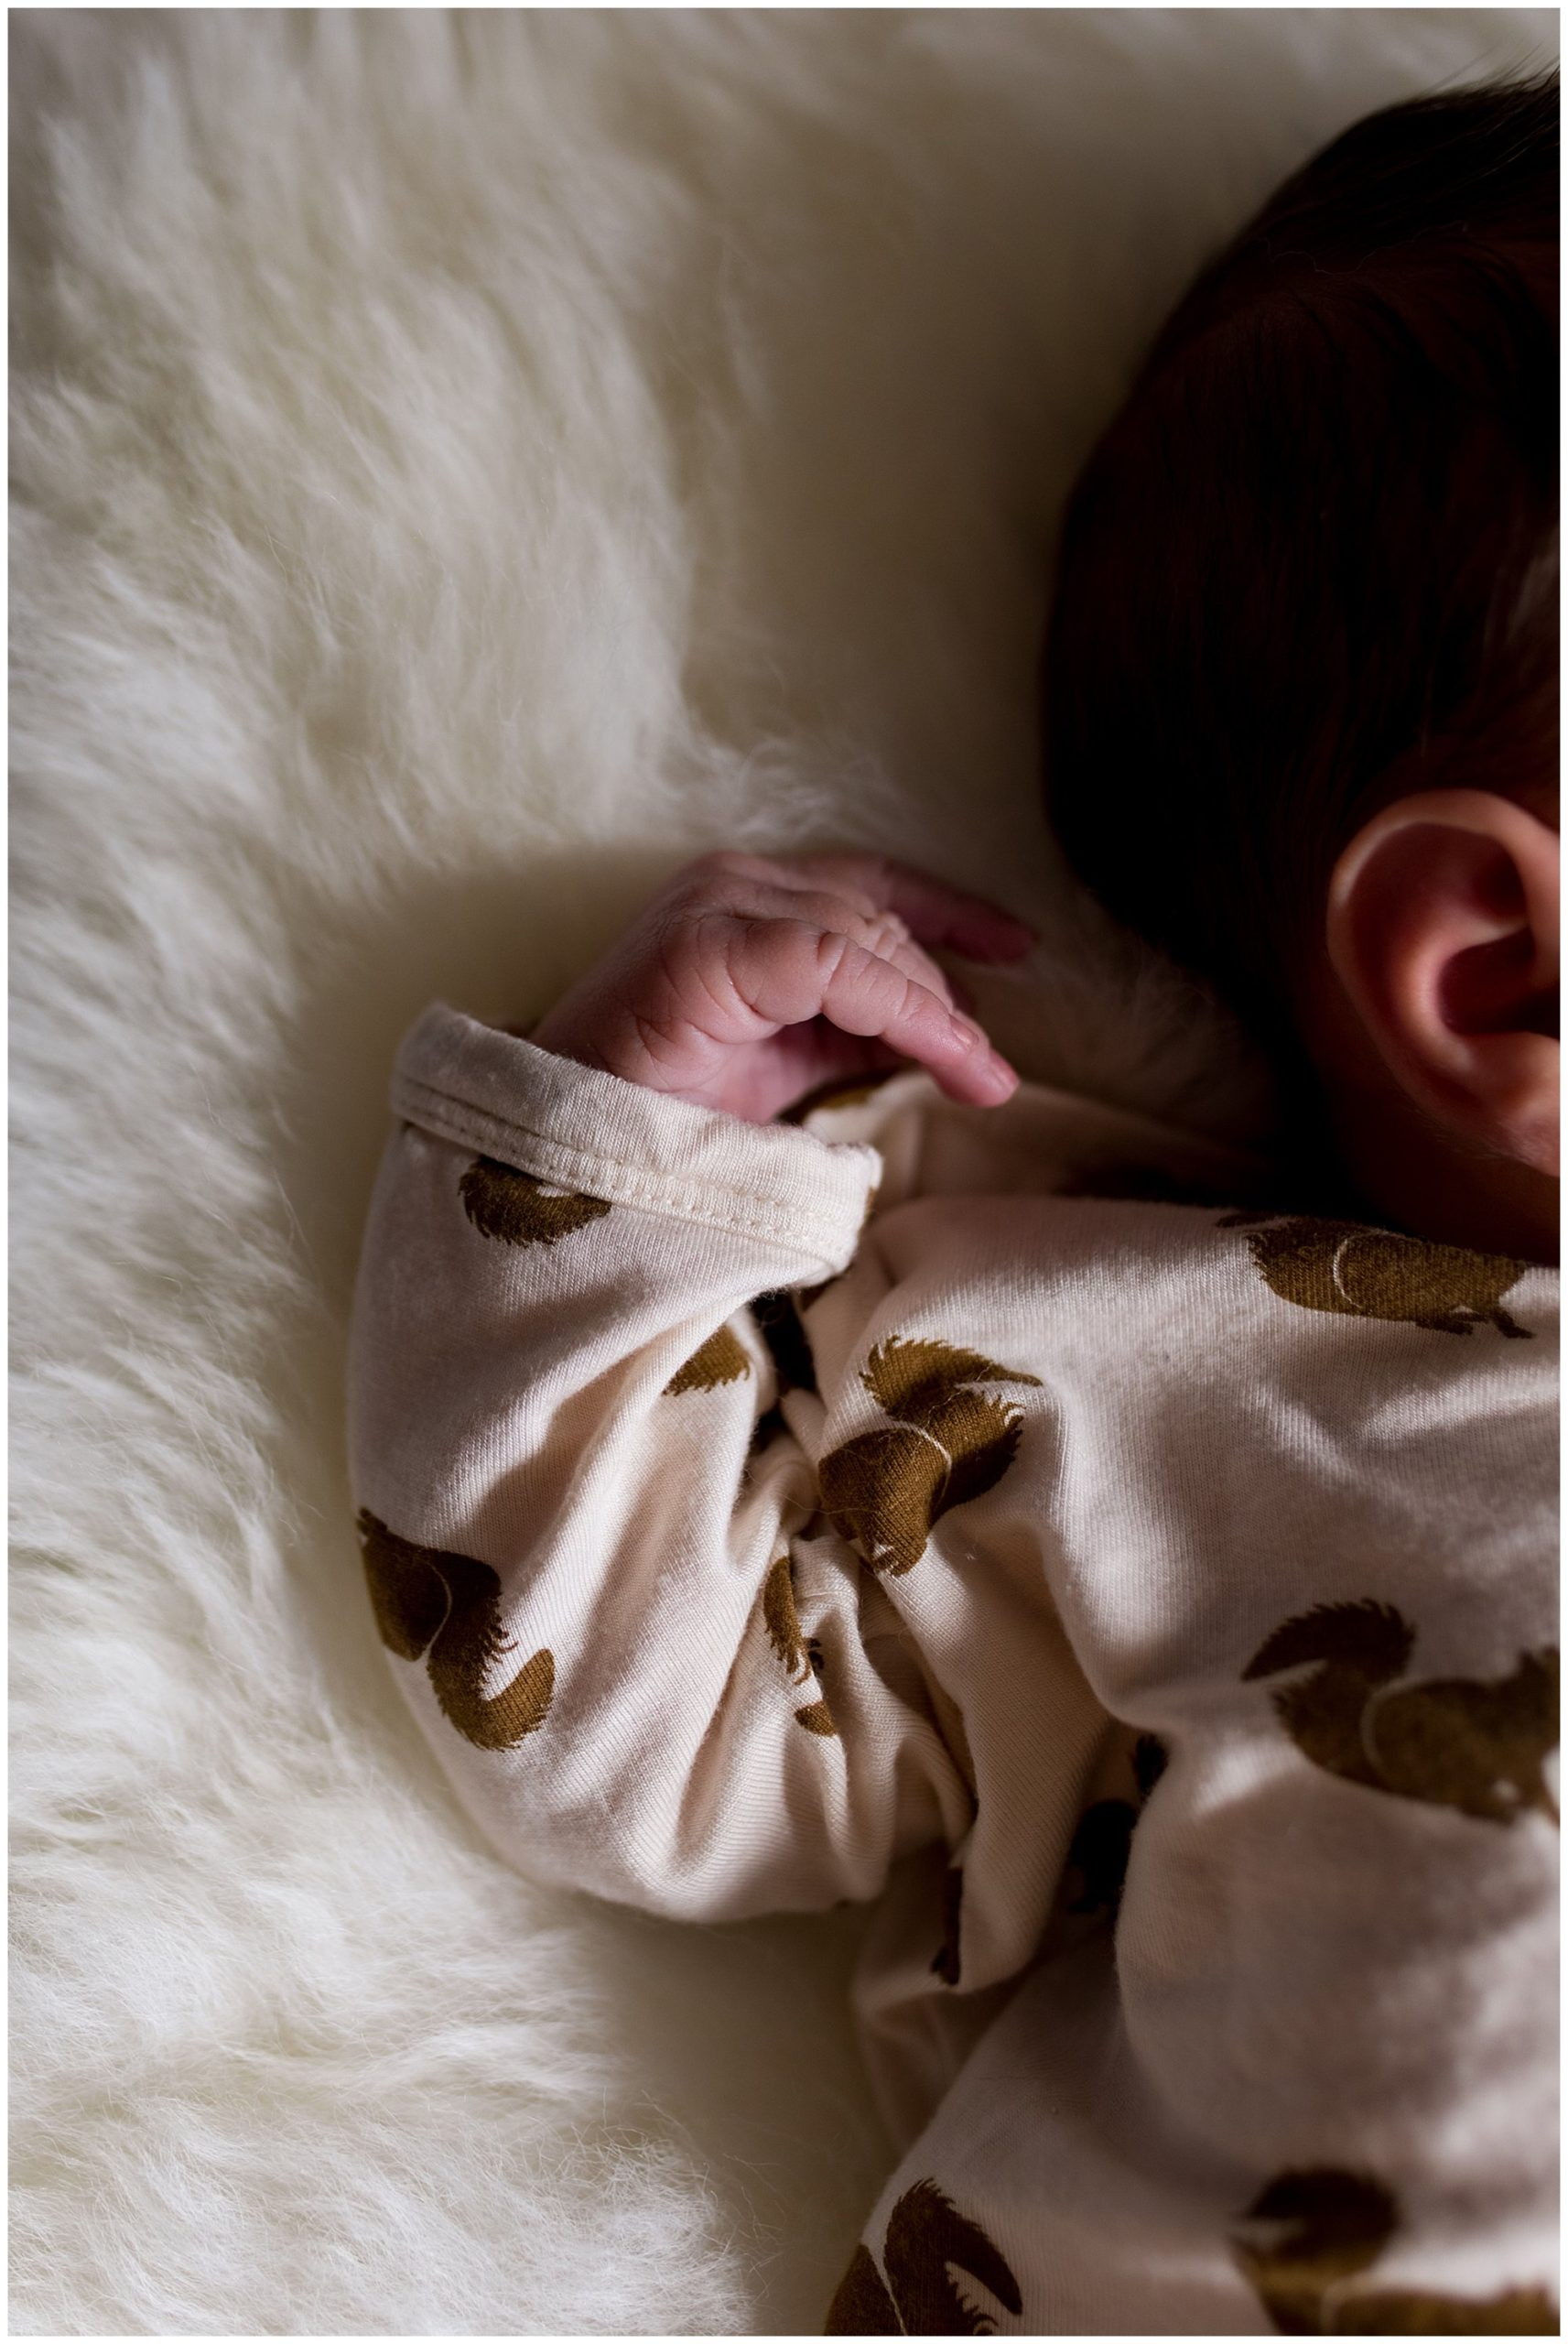 newborn's hands during newborn session in Indianapolis